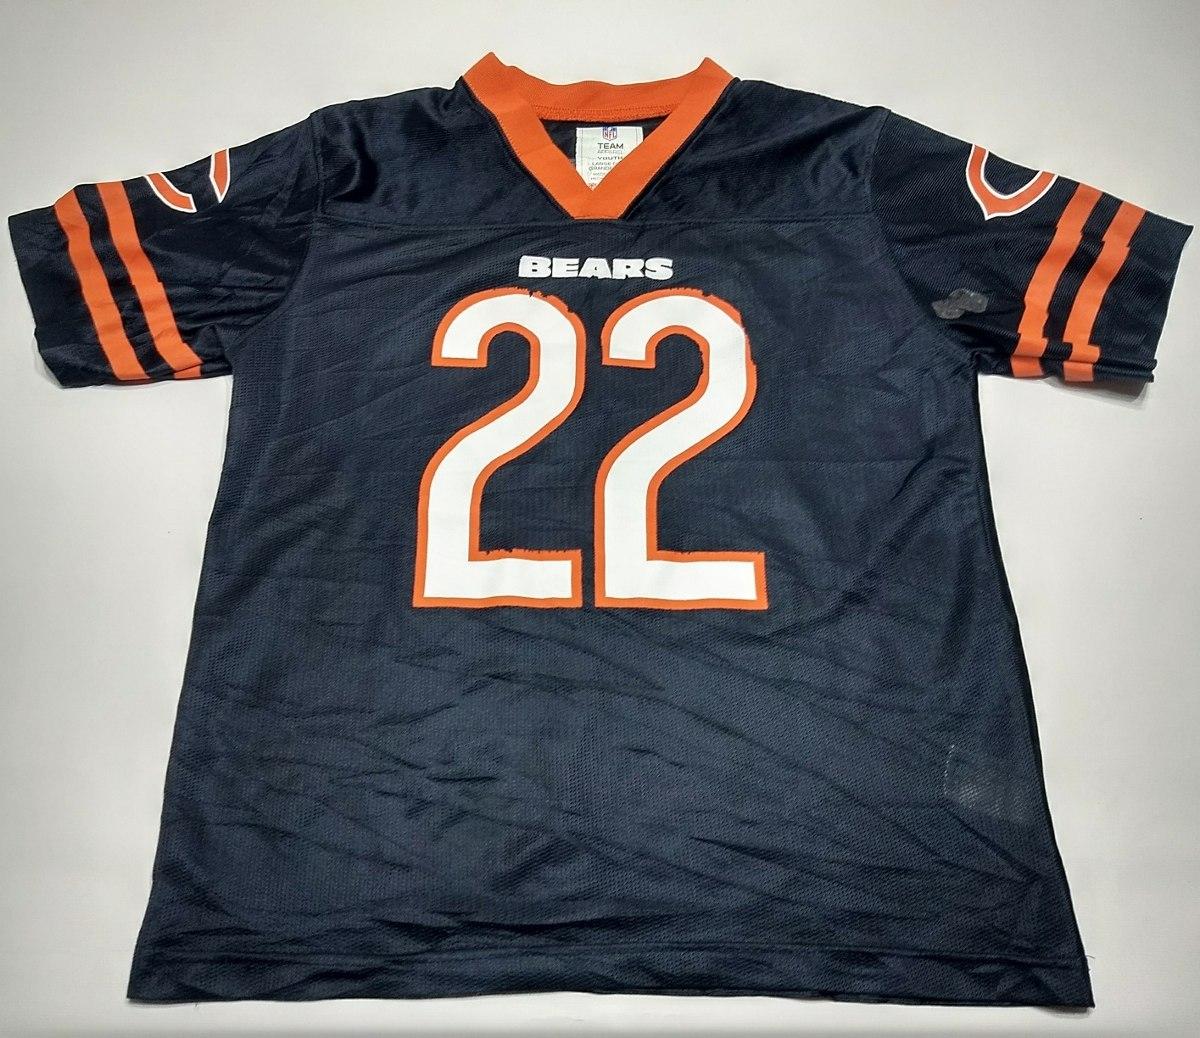 7d85b87006891 camiseta chicago bears football americano talle l niño nfl. Cargando zoom.